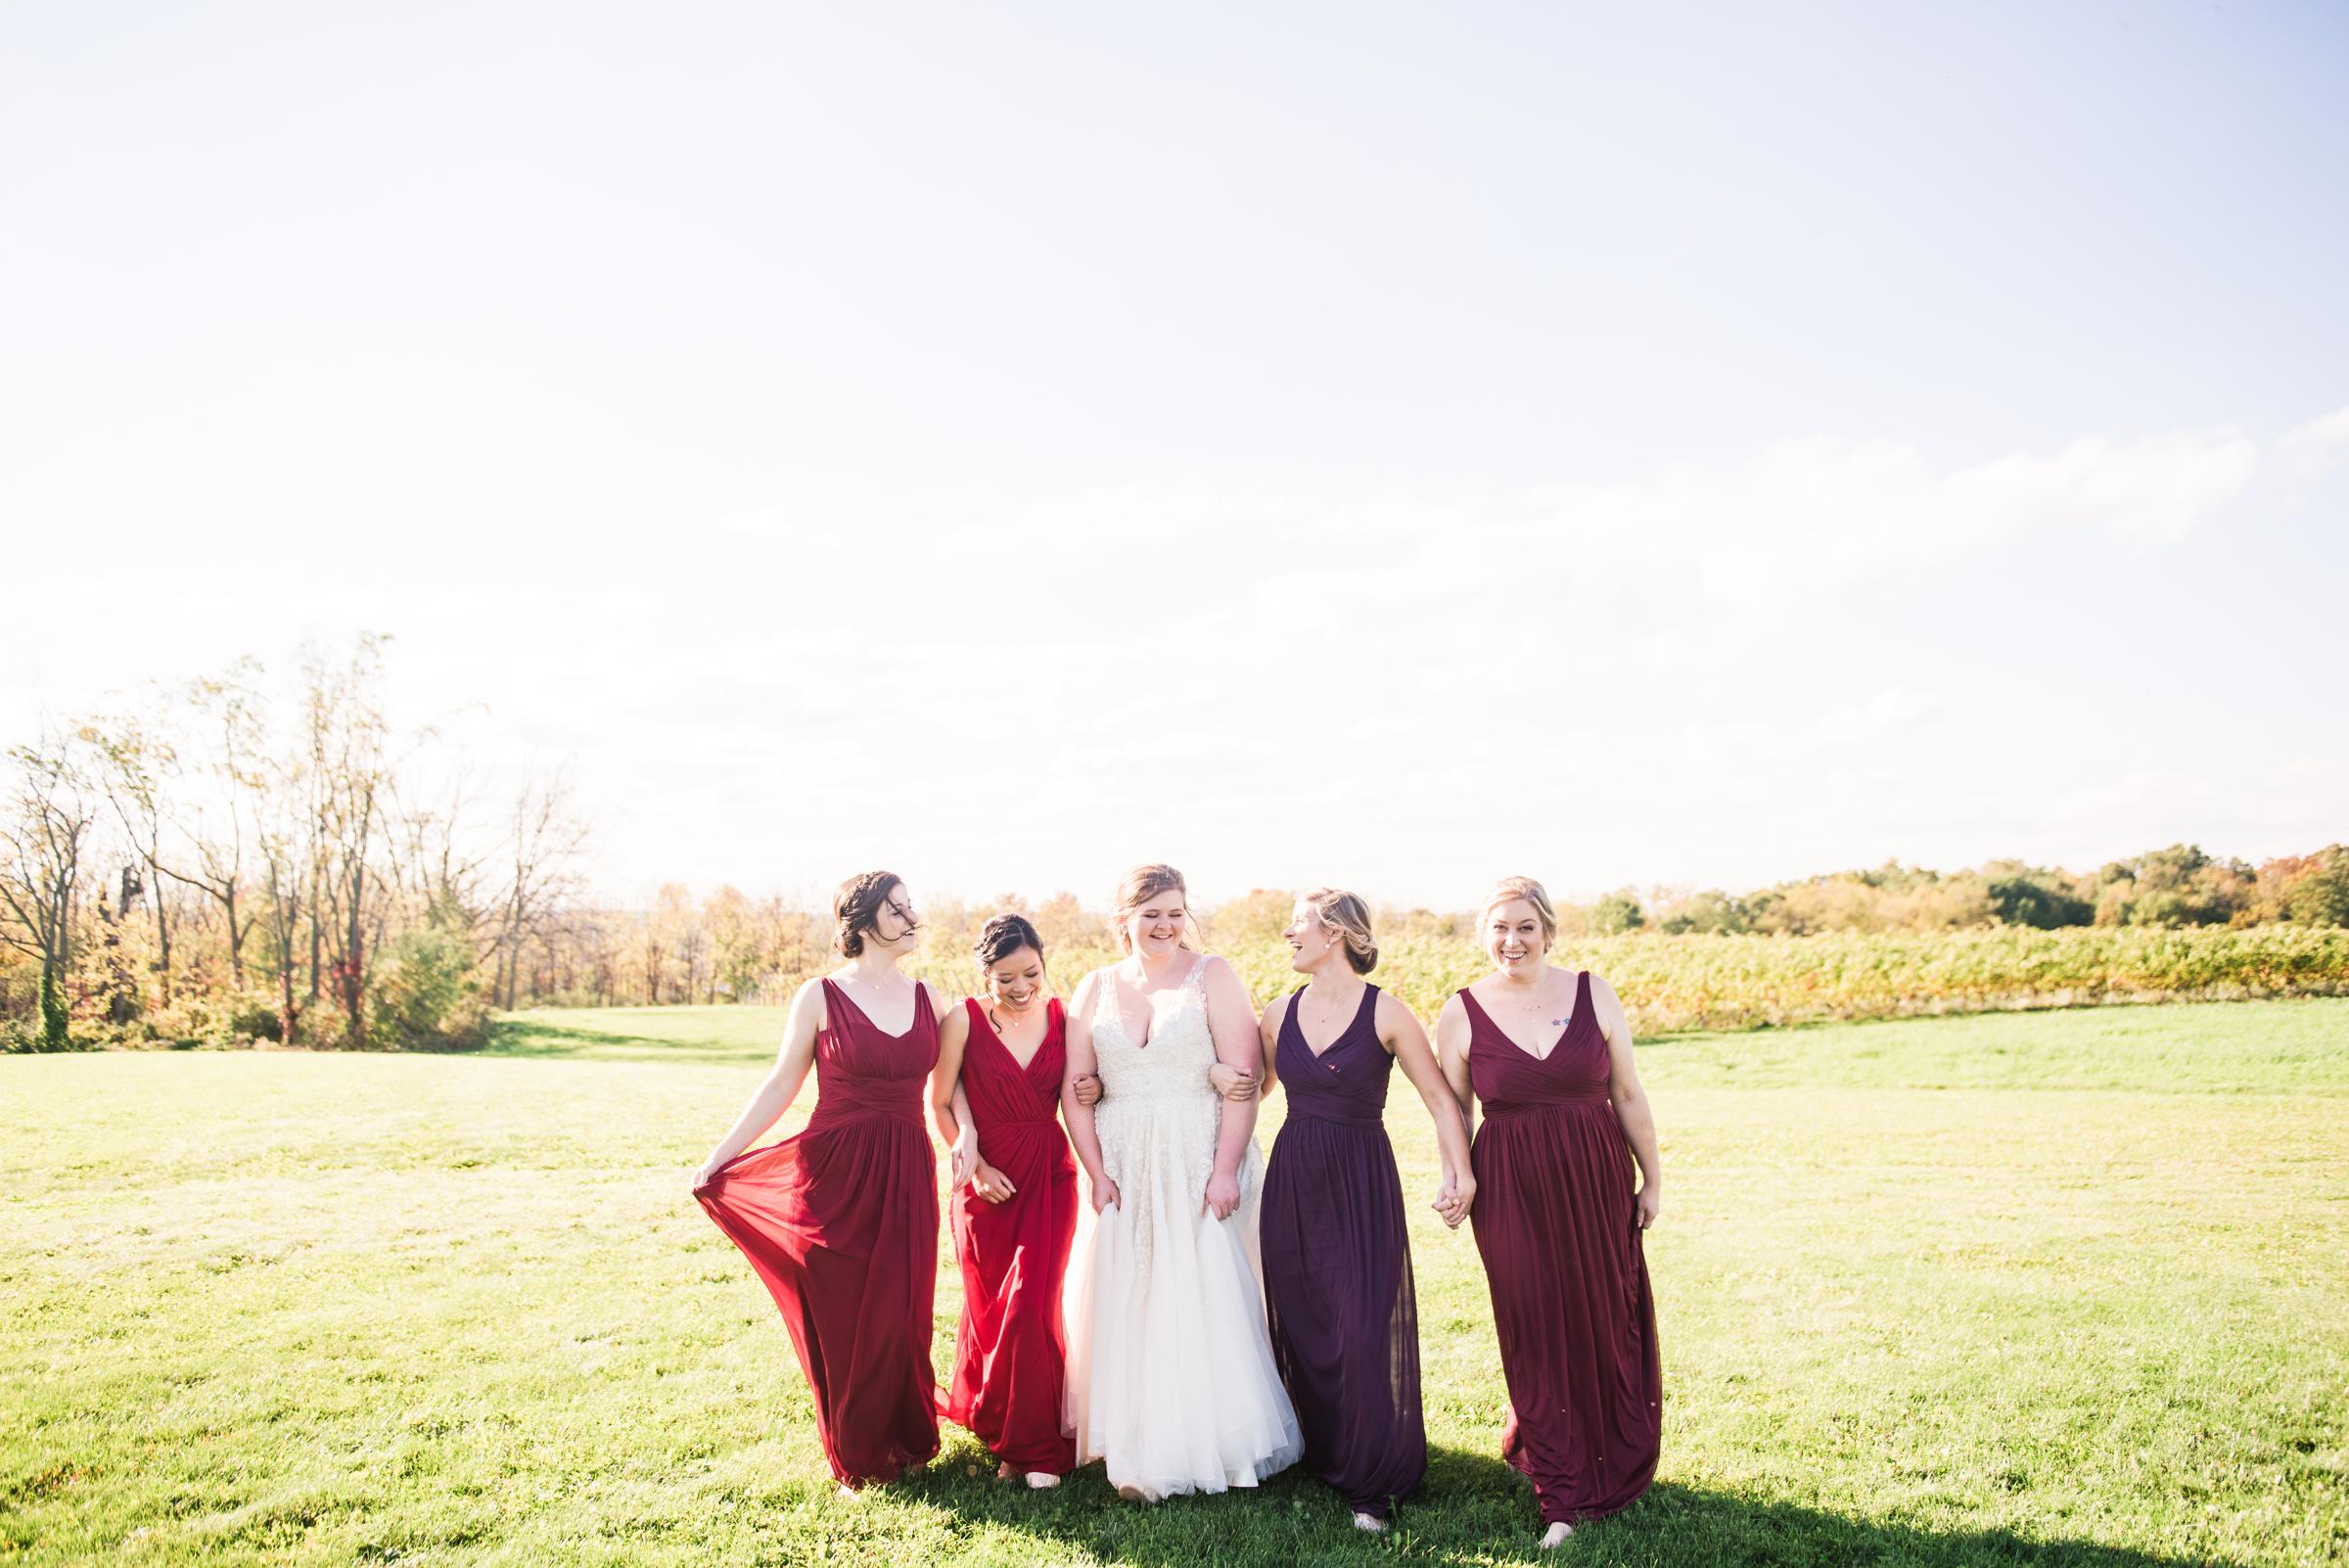 Zugibe_Vineyards_Finger_Lakes_Wedding_JILL_STUDIO_Rochester_NY_Photographer_DSC_3785.jpg